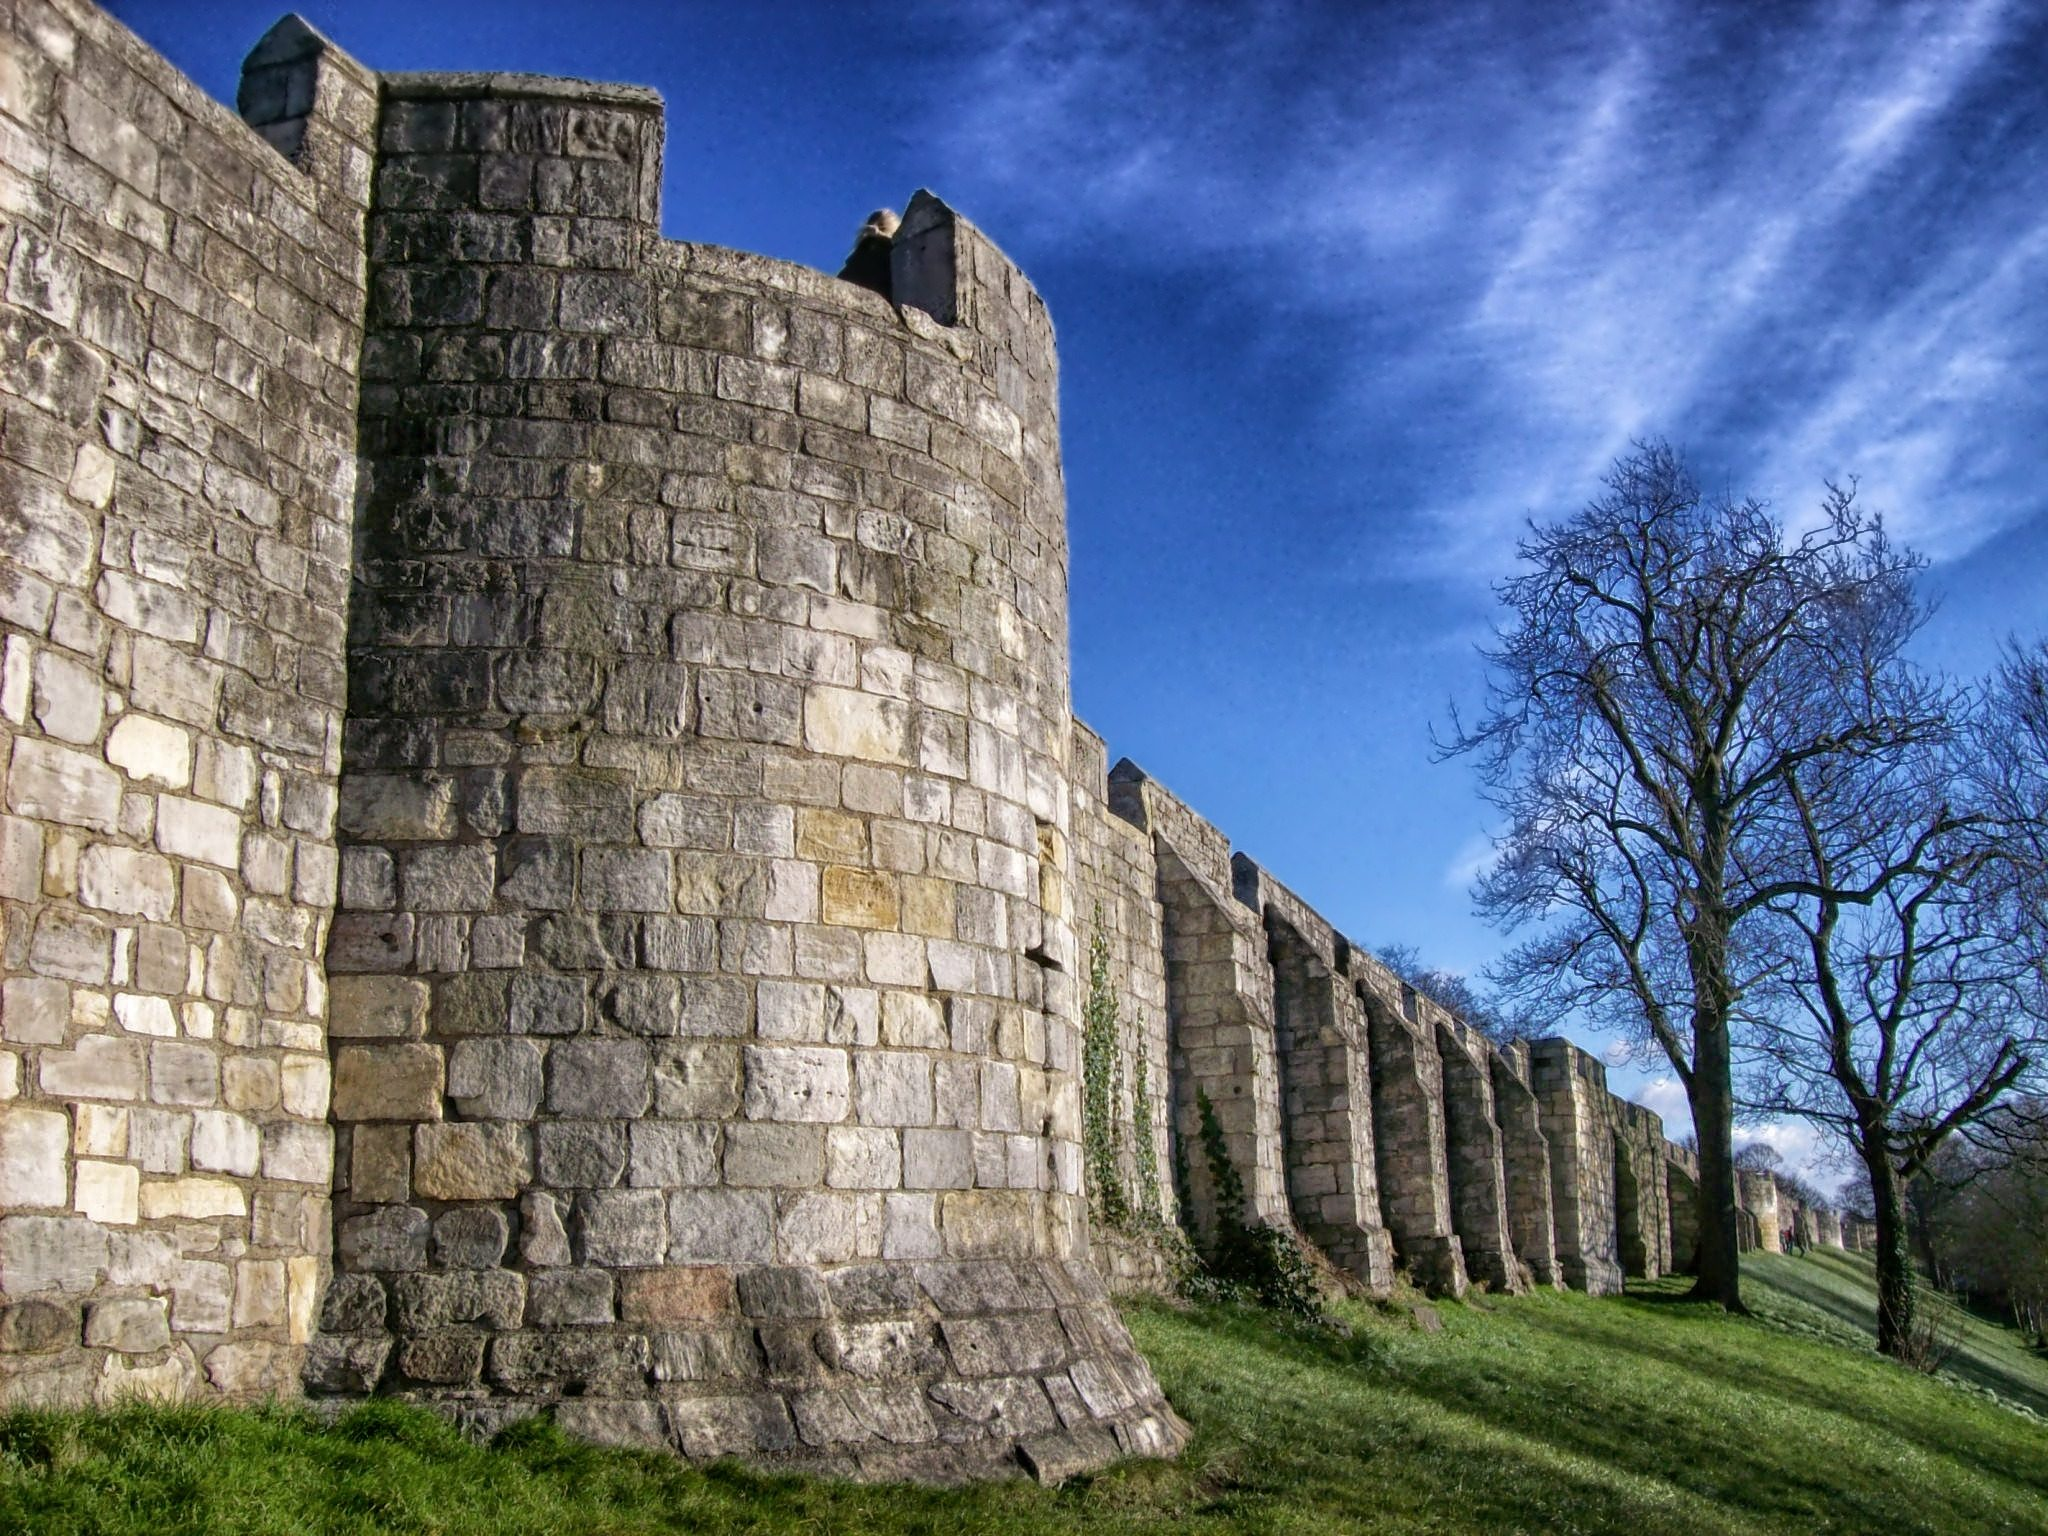 Parede, Cidade, Fortaleza, York, Inglaterra - Papéis de parede HD - Professor-falken.com